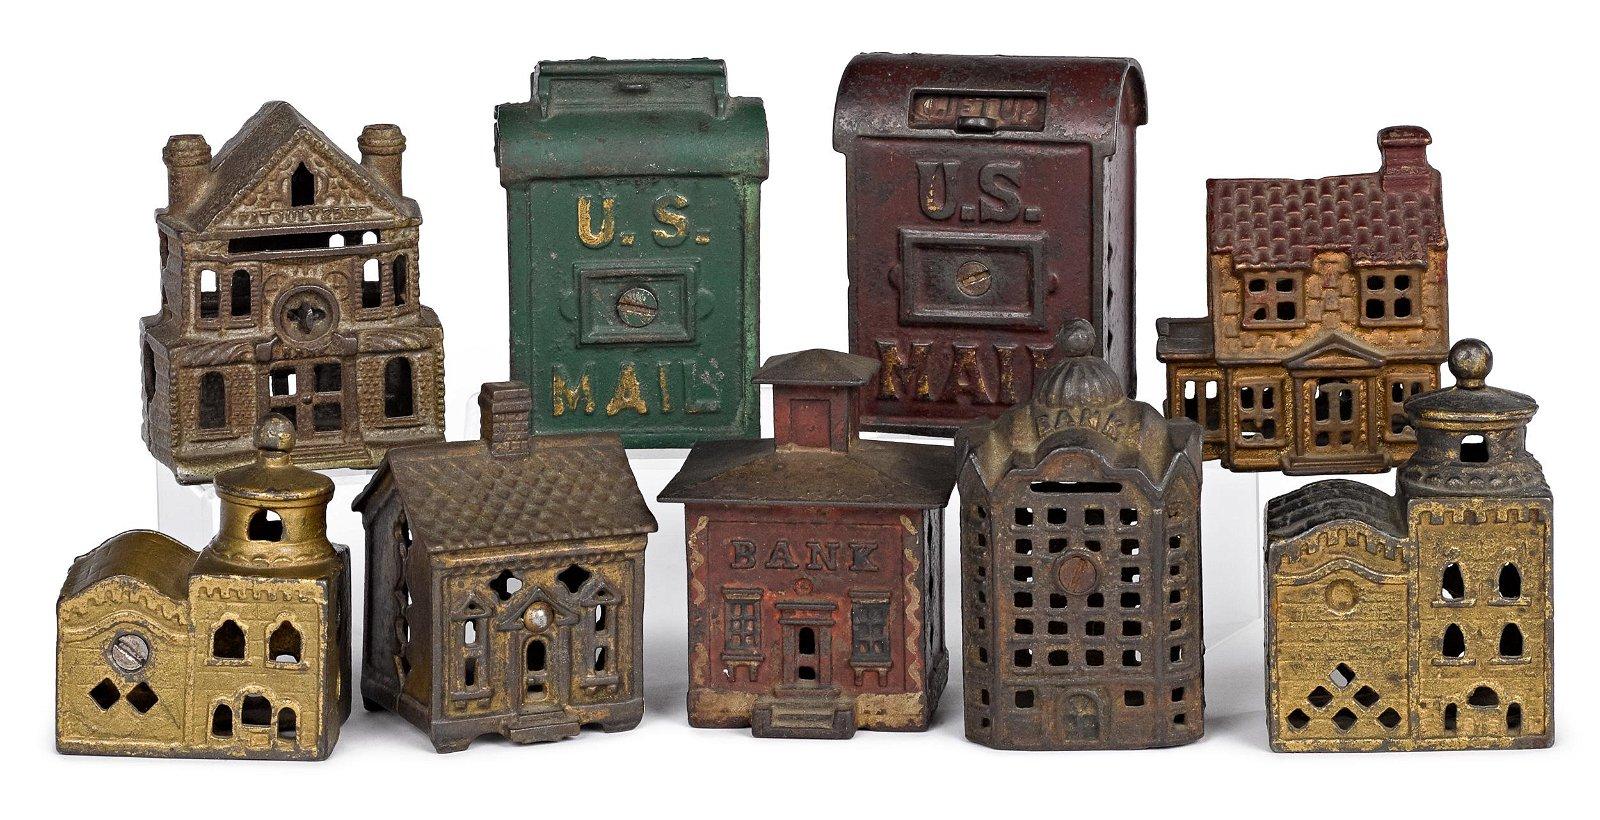 Nine cast iron still banks